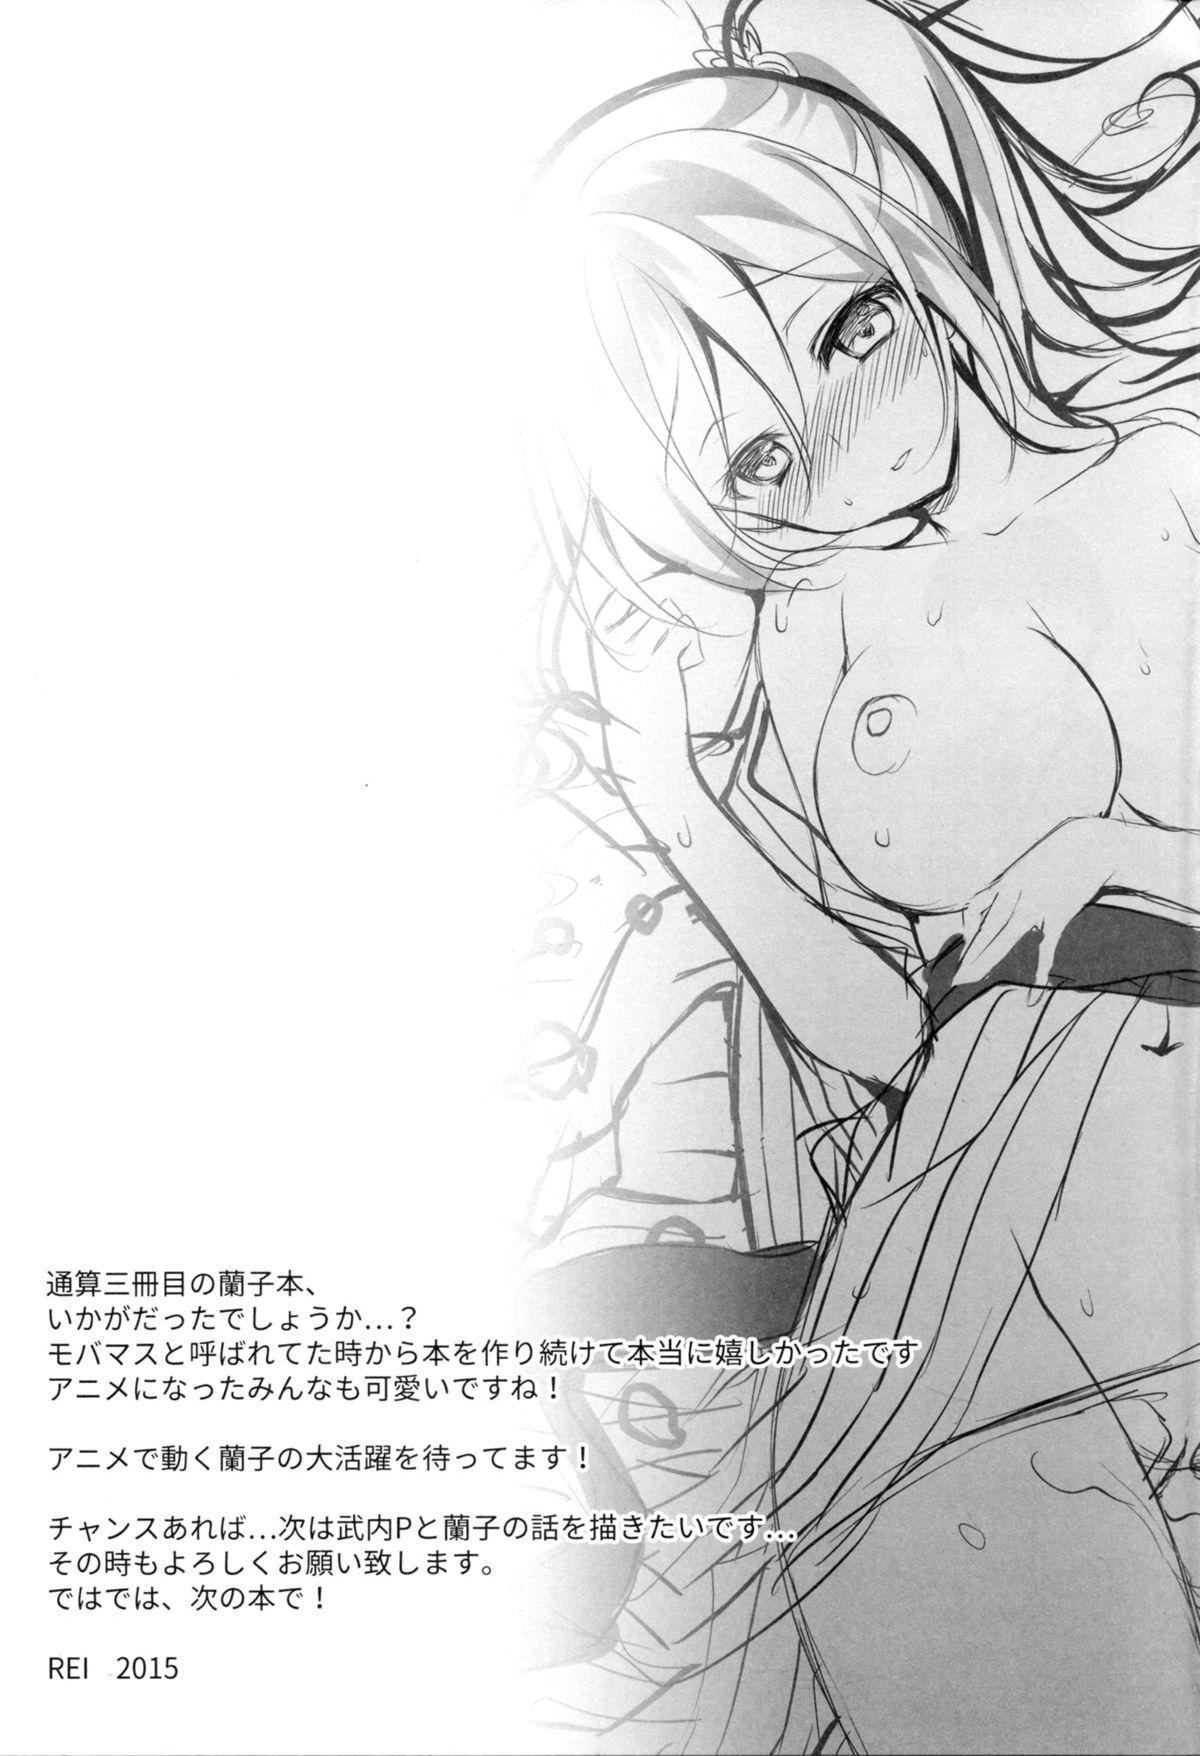 Cinderella no Aishikata | How to Love Cinderella 19